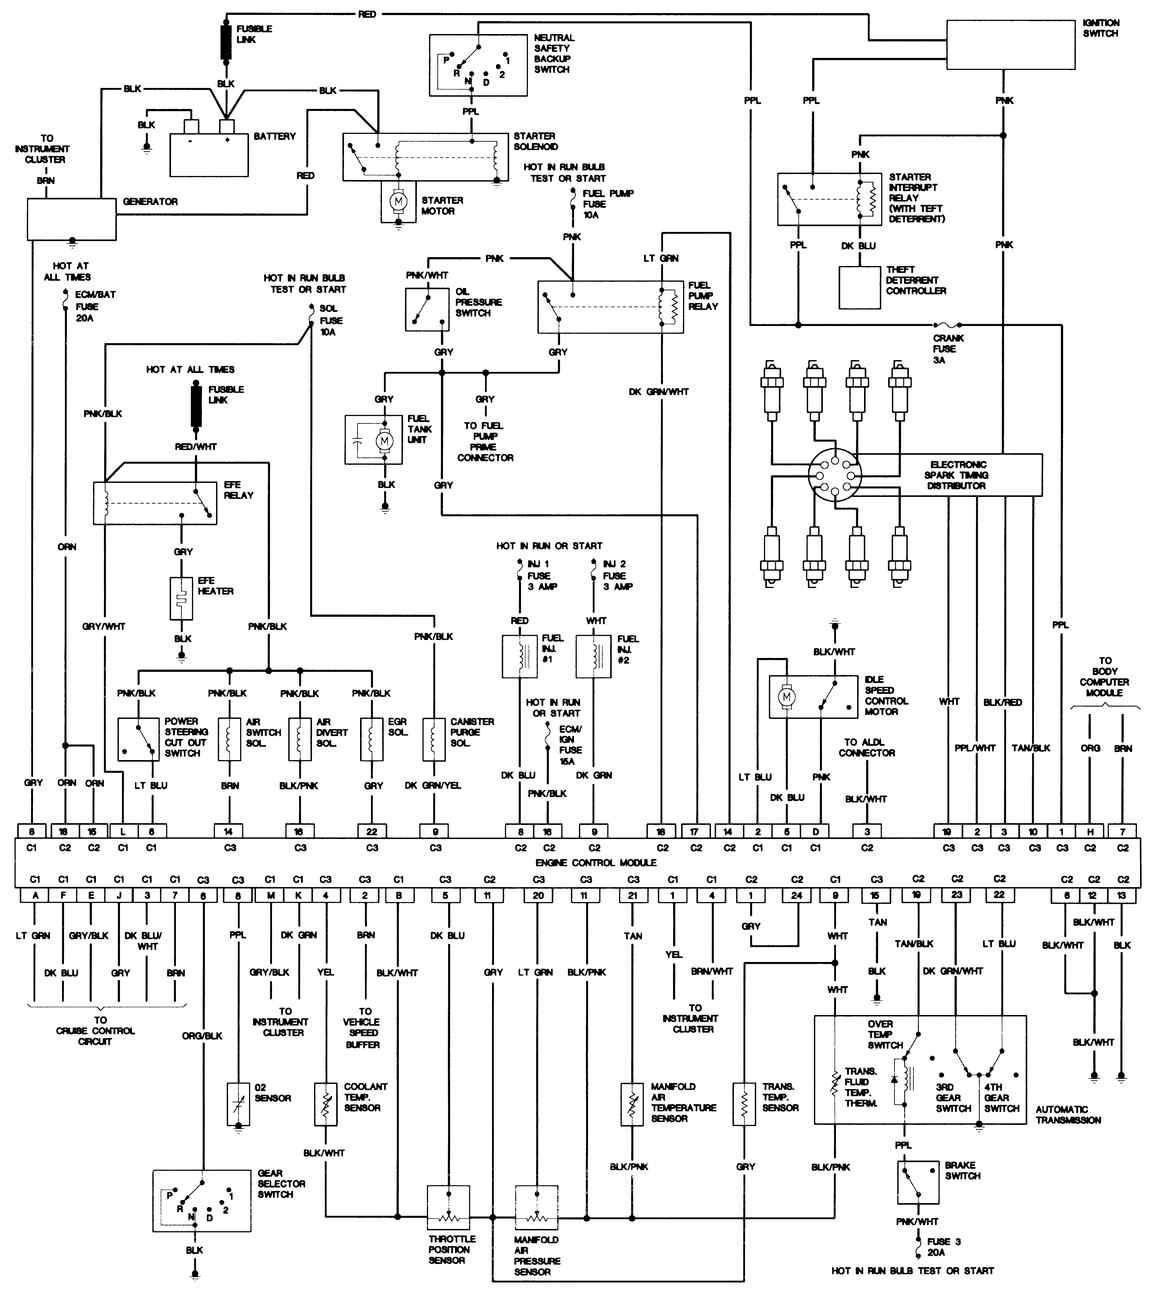 2002 Southwind 3 6r Coach Wiring Diagram Free For You Camper 20a Fleetwood Online Rh 2 8 51 Shareplm De